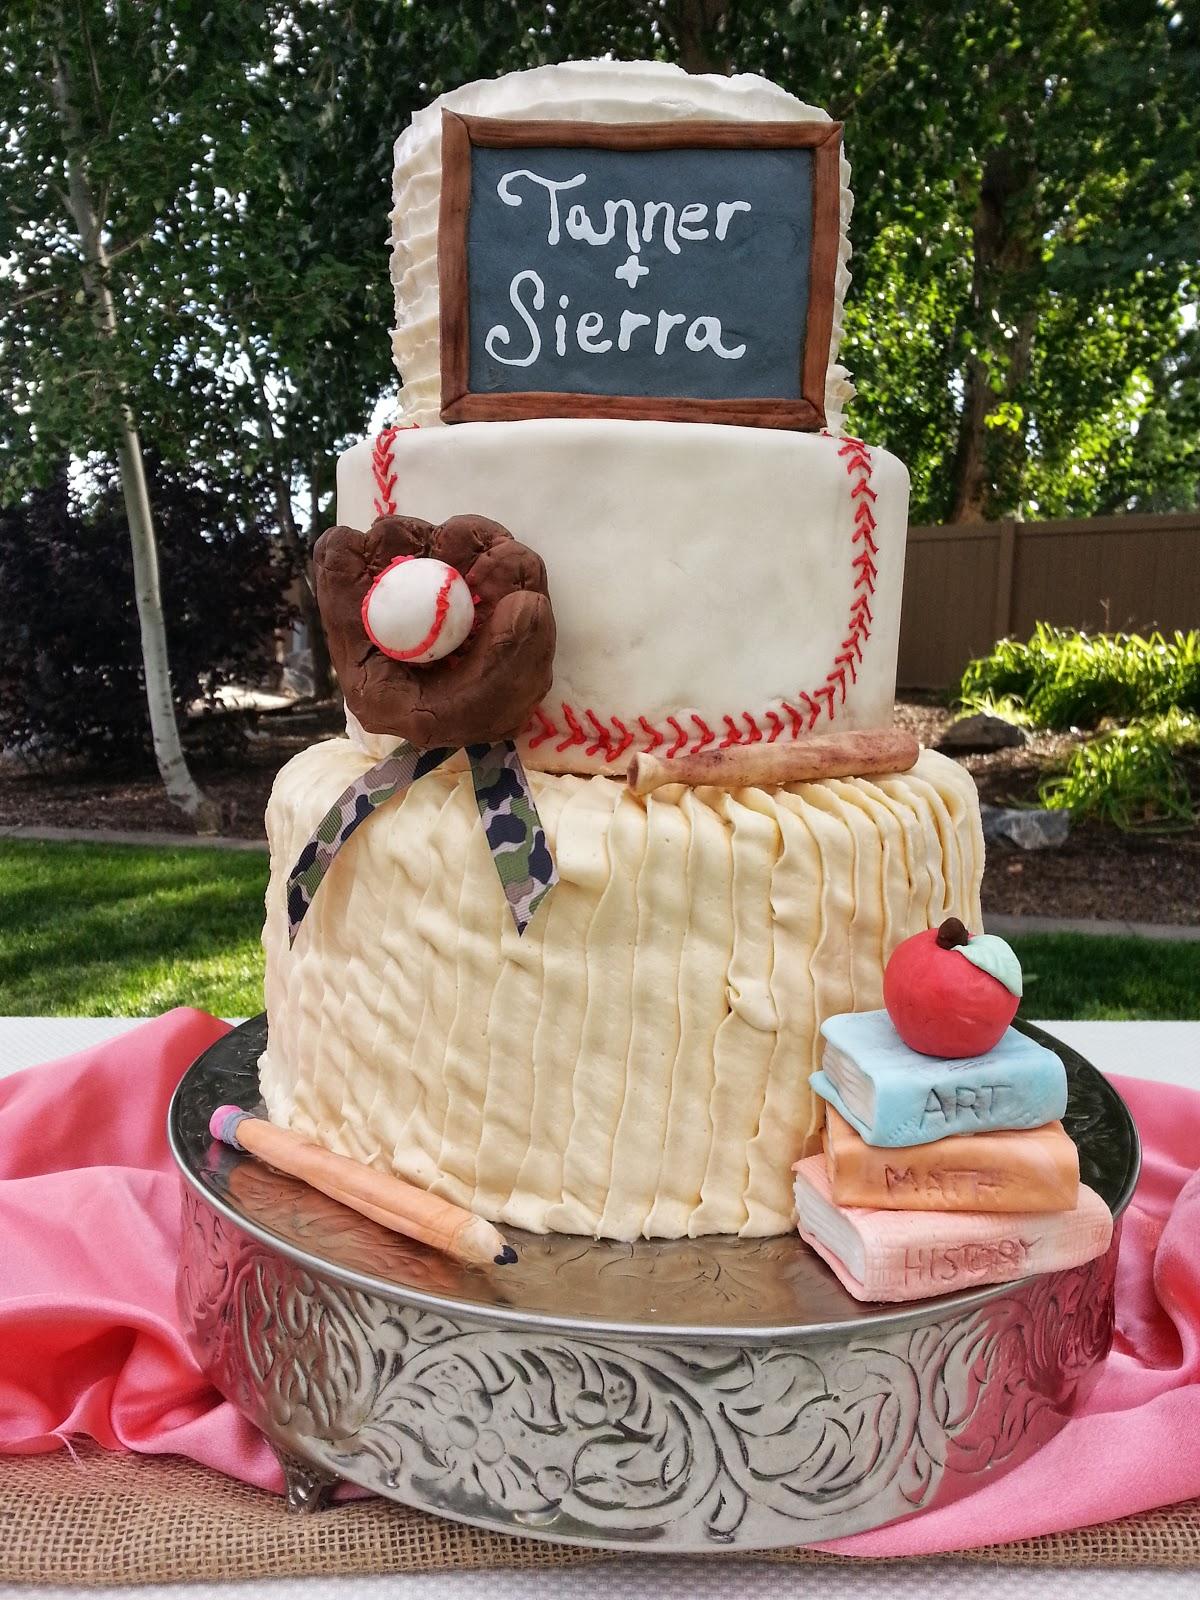 Cakes By Carla Teacher And Baseball Themed Wedding Cake